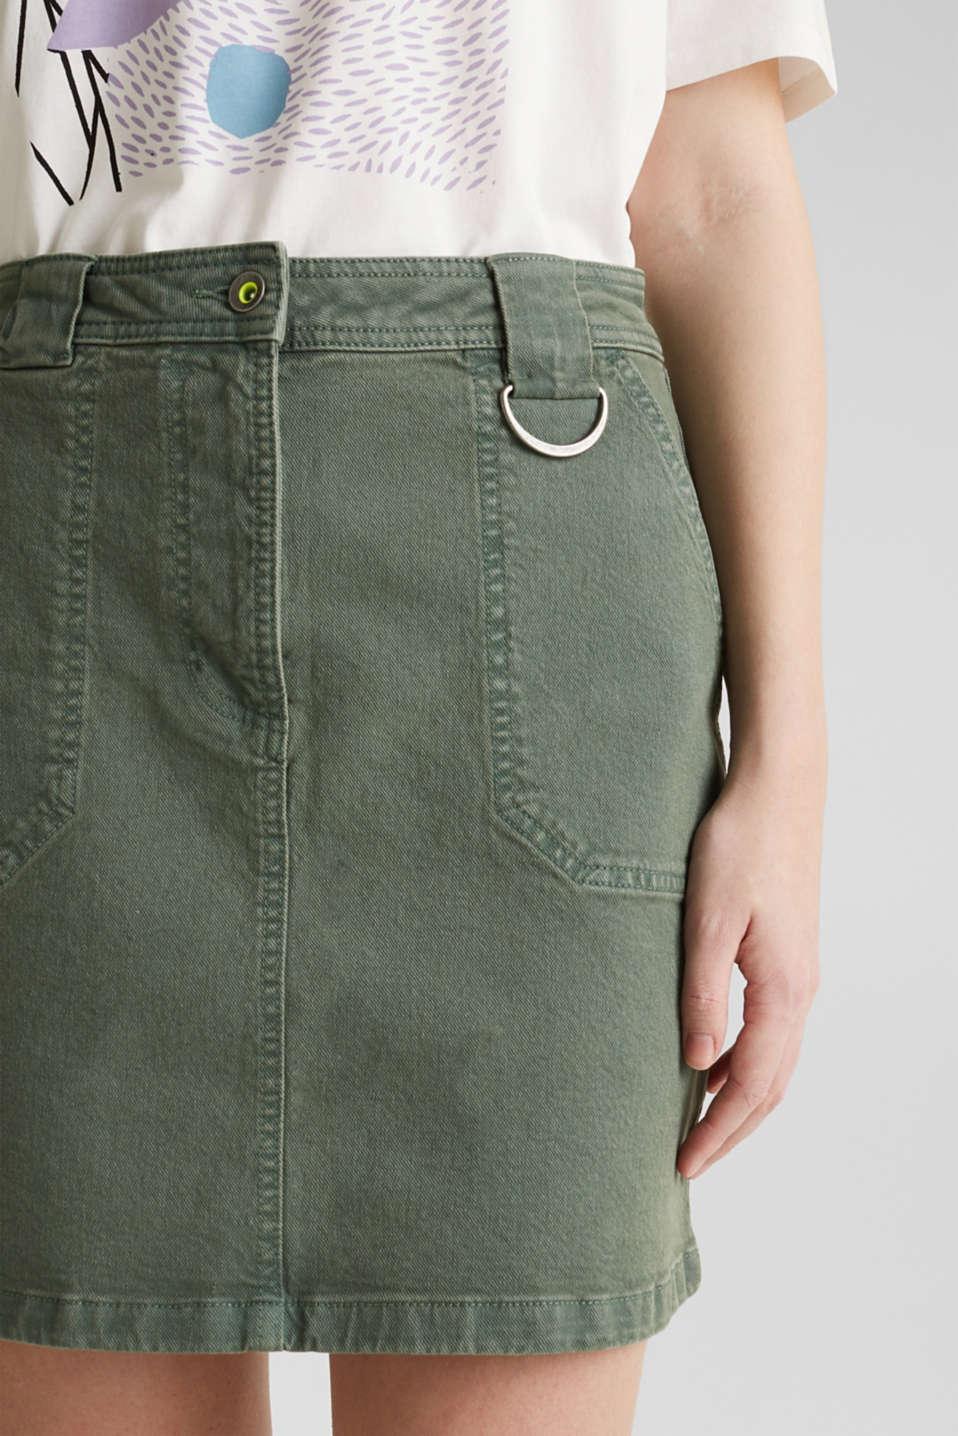 Denim skirt with pockets, KHAKI GREEN, detail image number 2